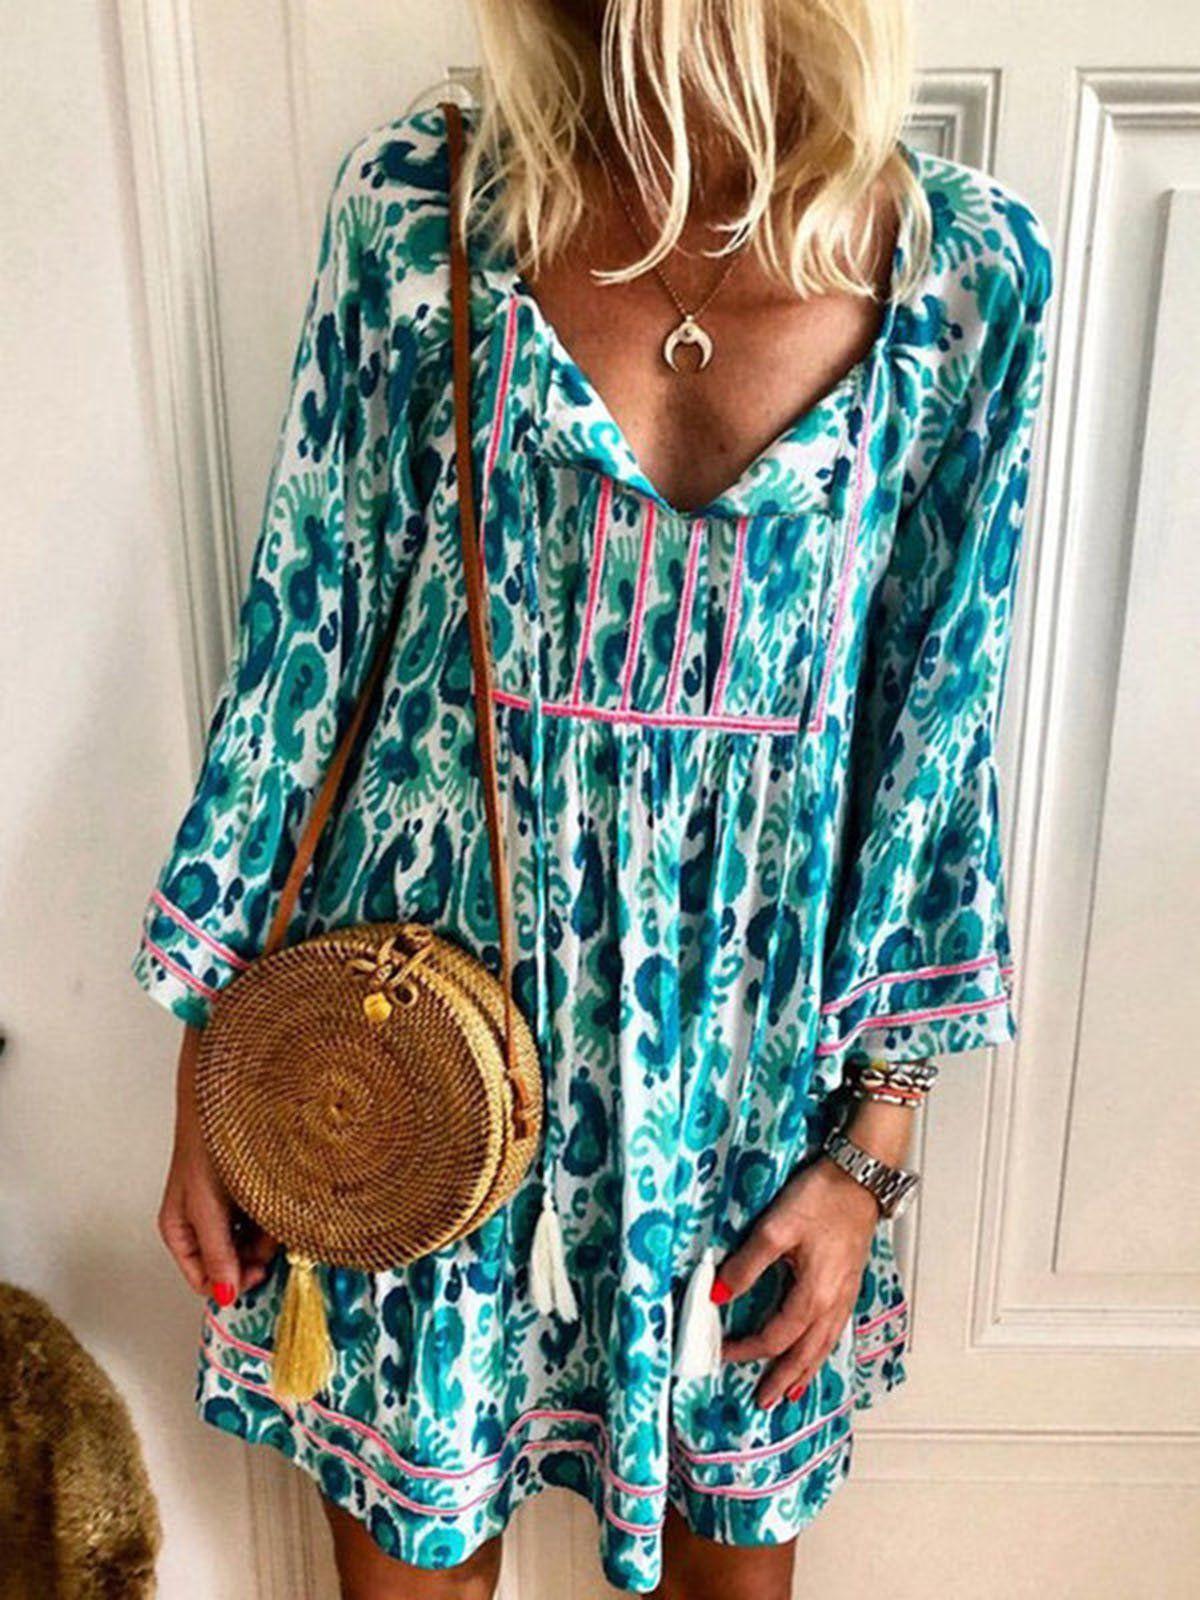 Anniecloth Summer Dresses Long Sleeve Shirt Dress Daily Shift V Neck Casual Printed Dres Printed Casual Dresses Long Sleeve Shift Dress Long Sleeve Shirt Dress [ 1600 x 1200 Pixel ]